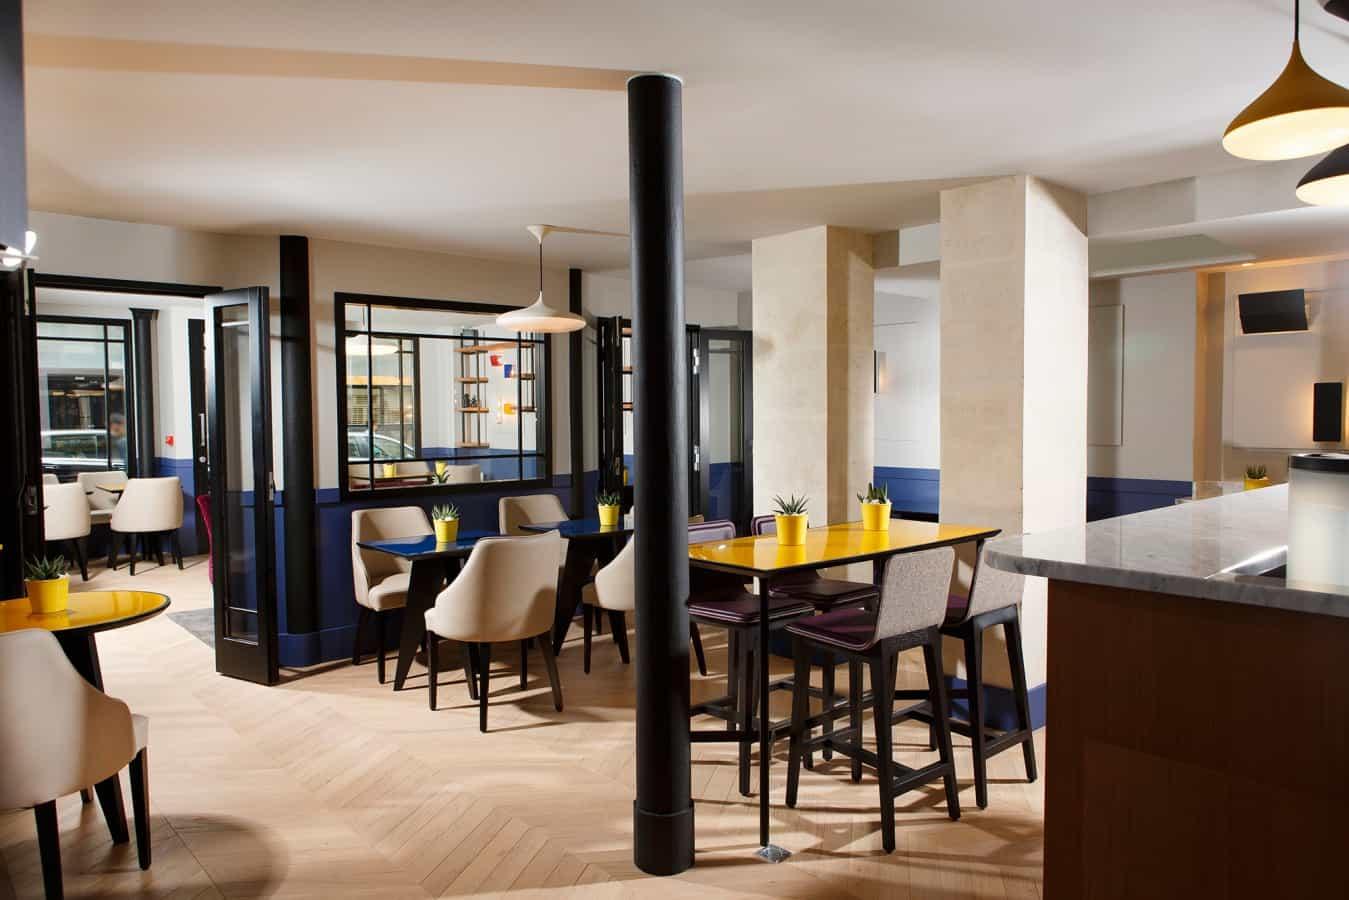 hotel-les-matins-de-paris-spa-bienvenue-a-l-hotel-les-matins-de-paris-sizel-432723-1600-900